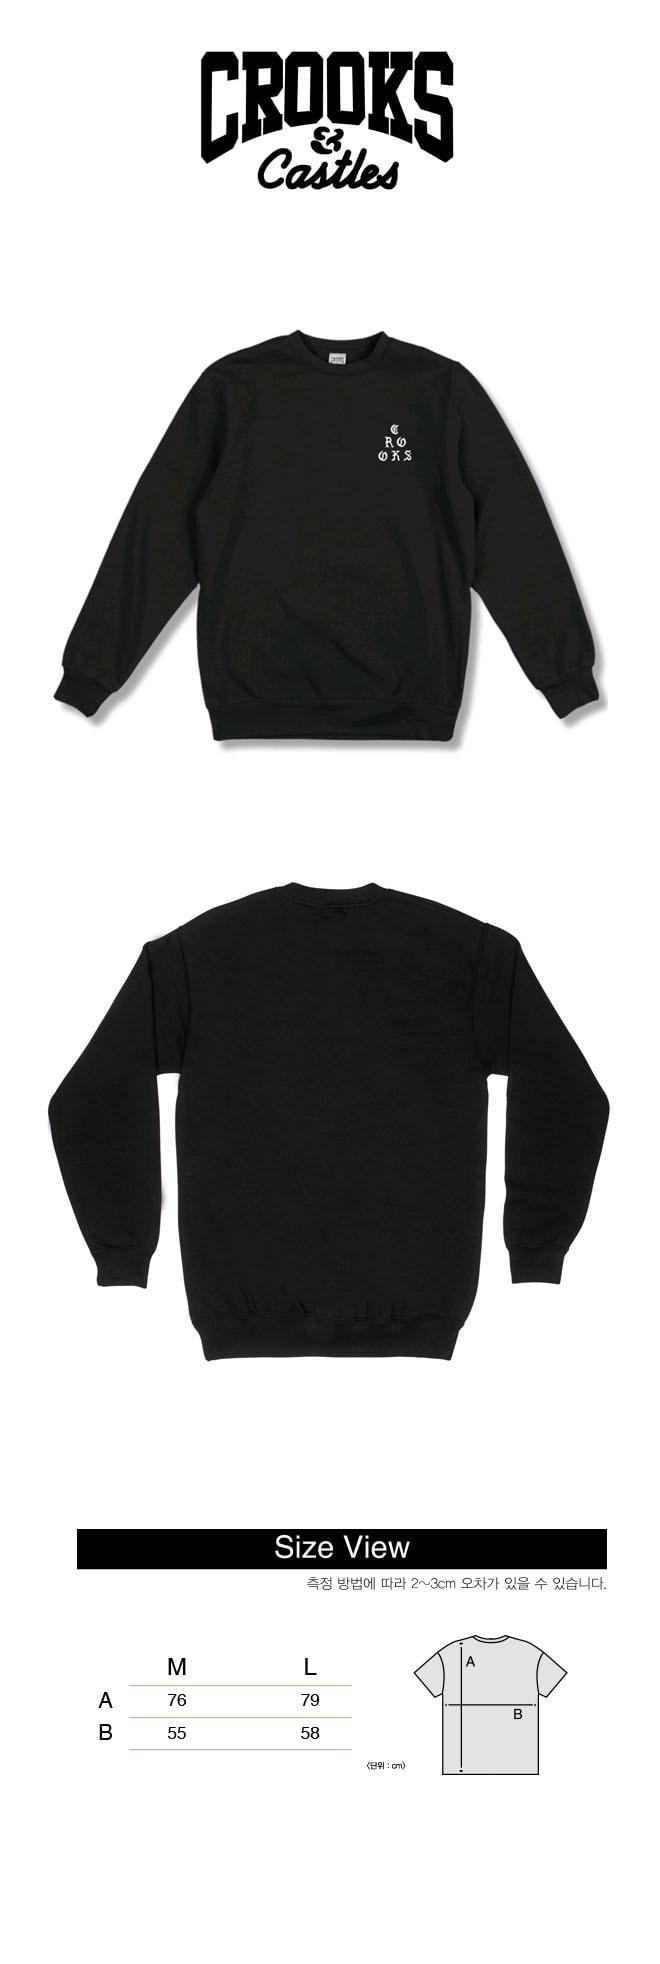 CROOKS & CASTLES Crew Sweatshirt Stacked - Black